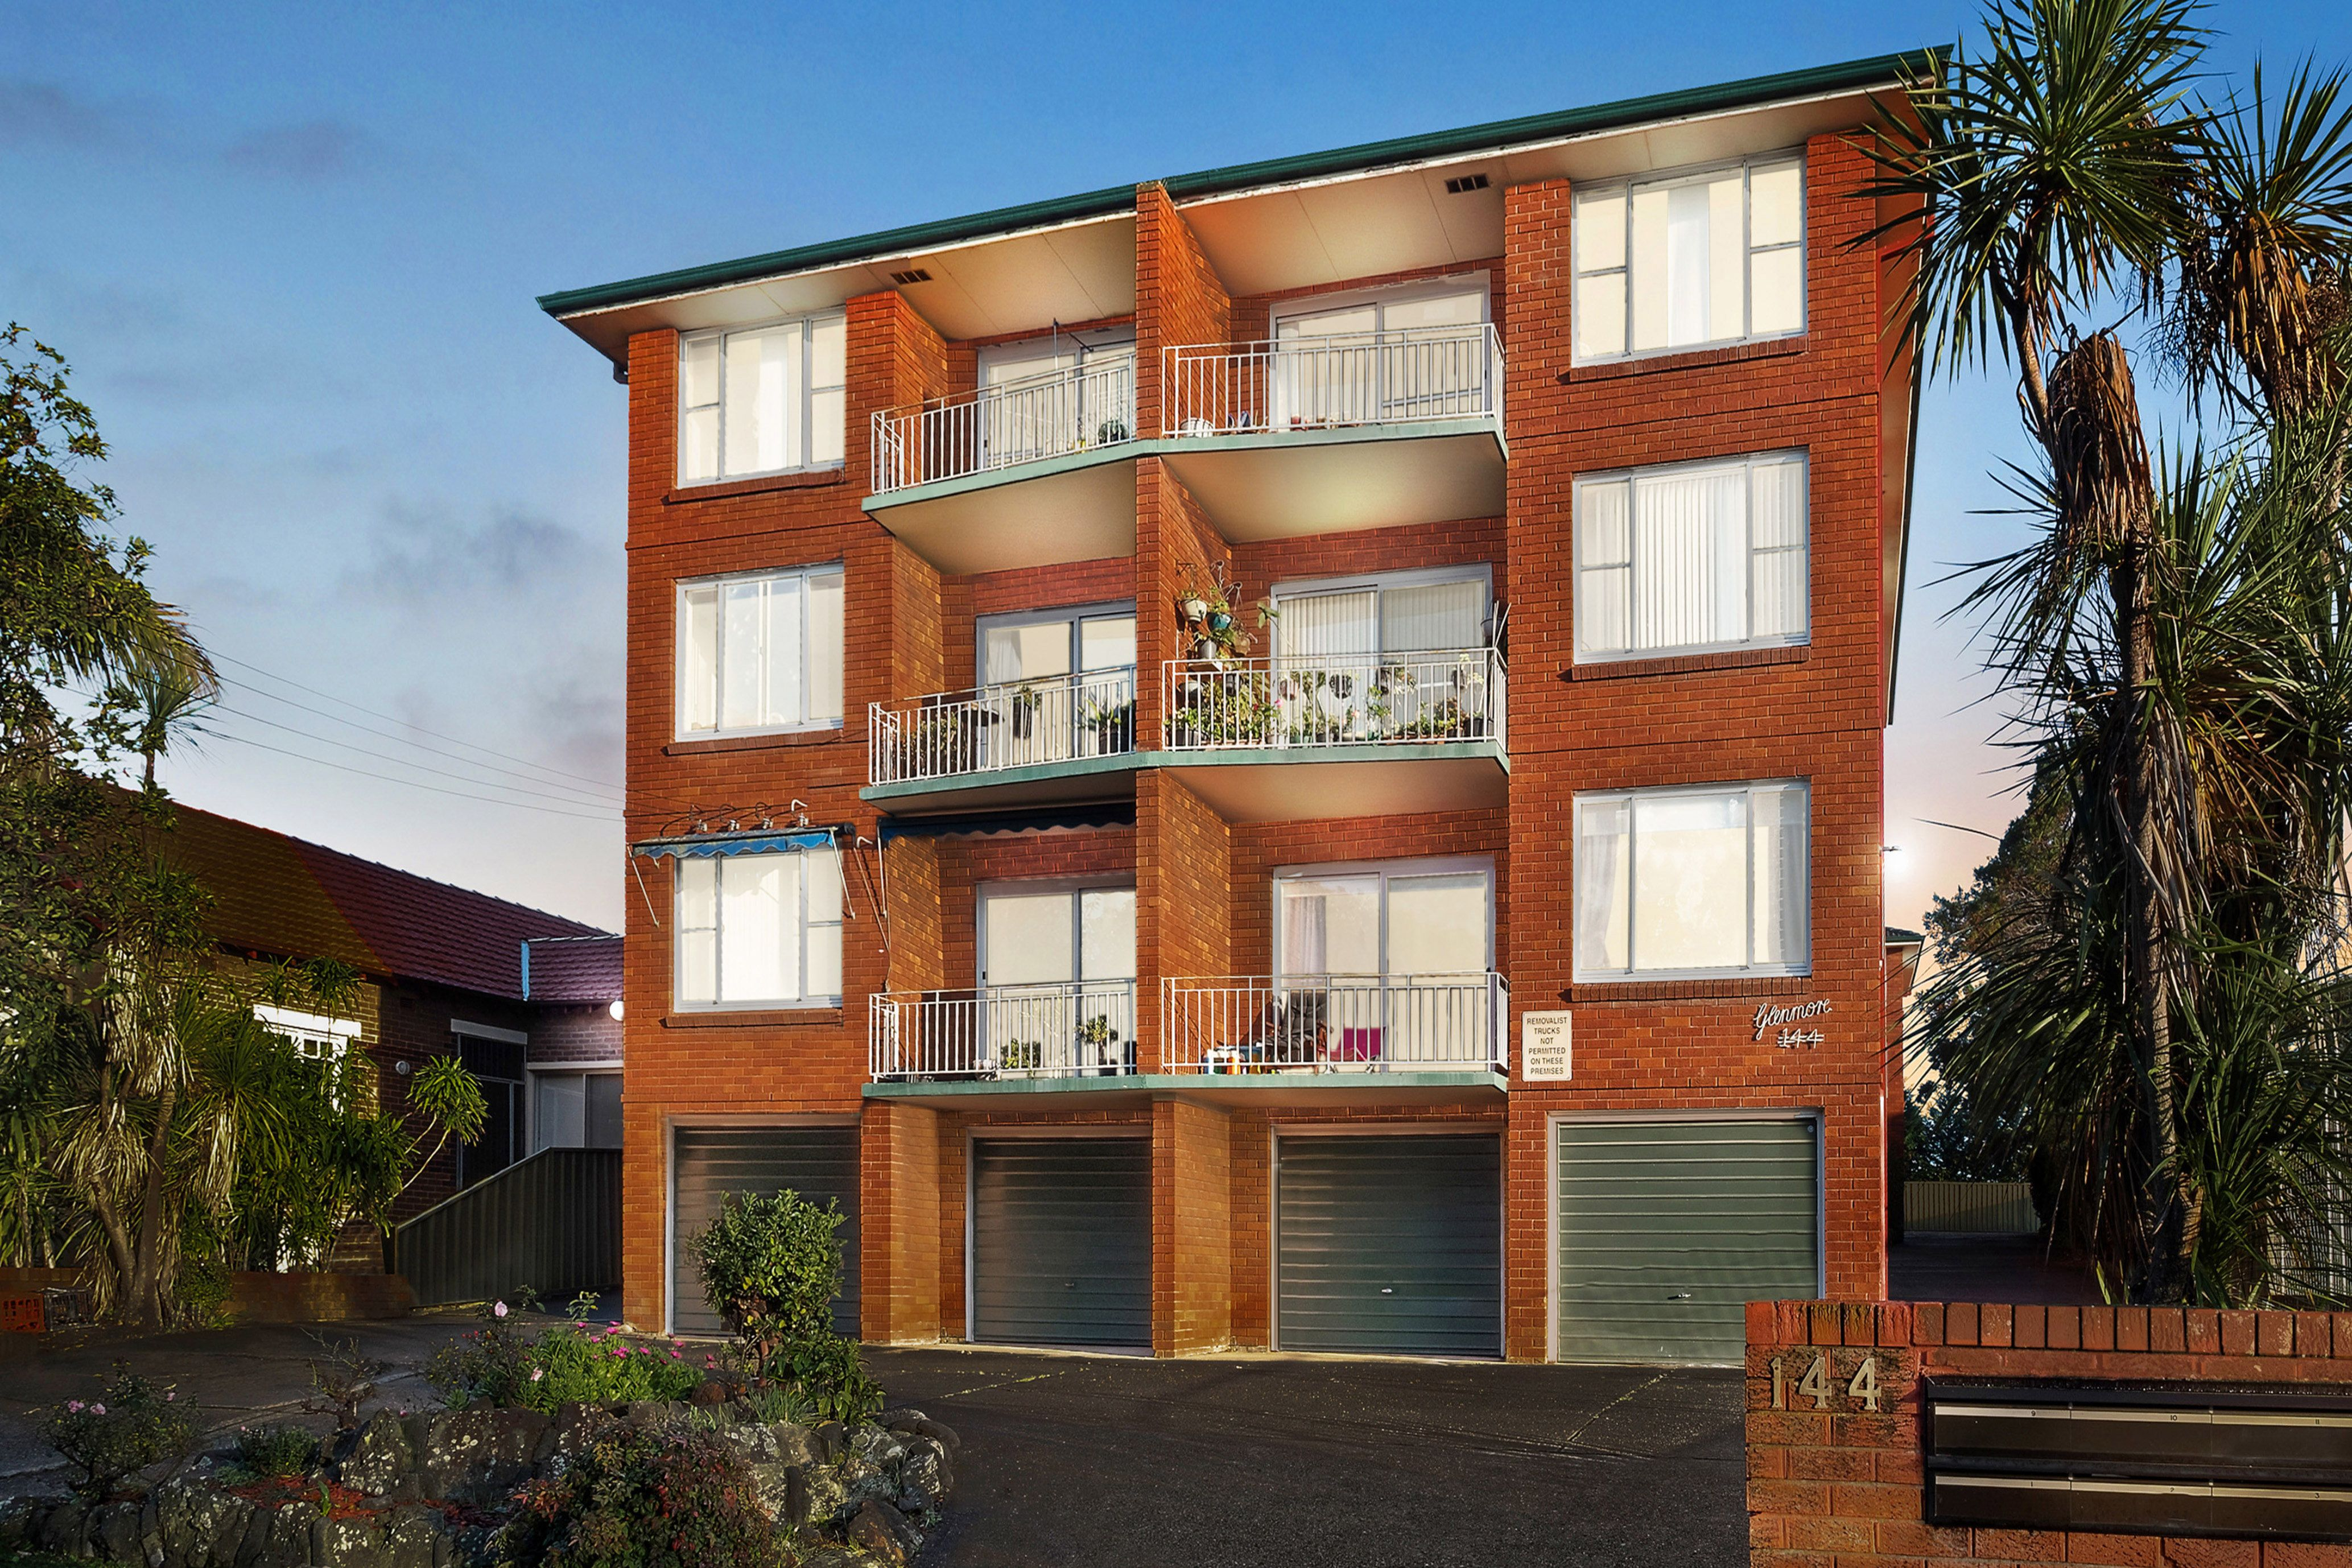 15/144 Edwin Street, Croydon NSW 2132